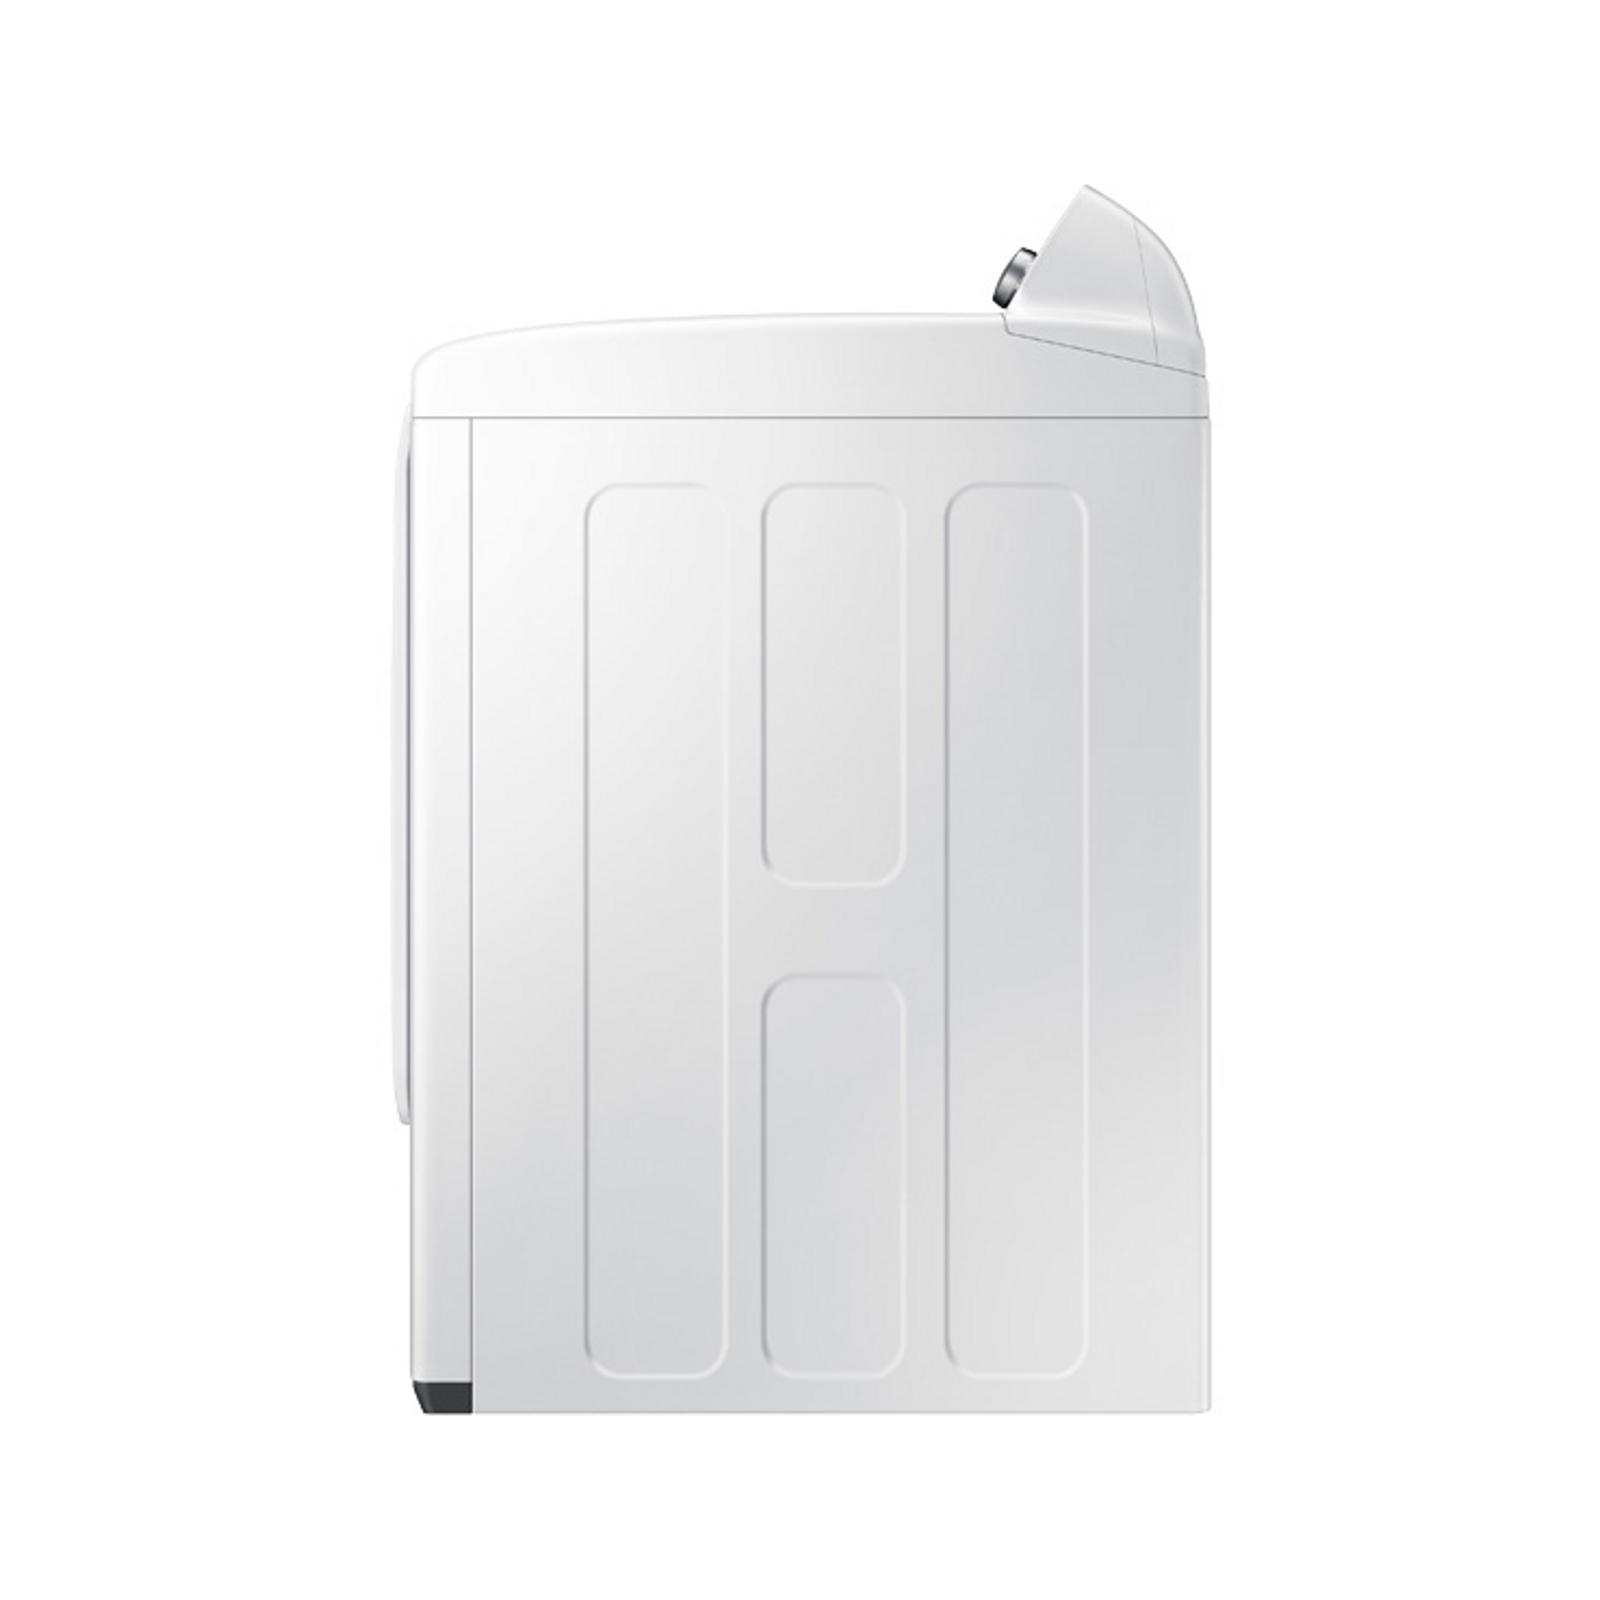 Samsung DV45H7000GW 7.4 cu. ft. Gas Dryer - White